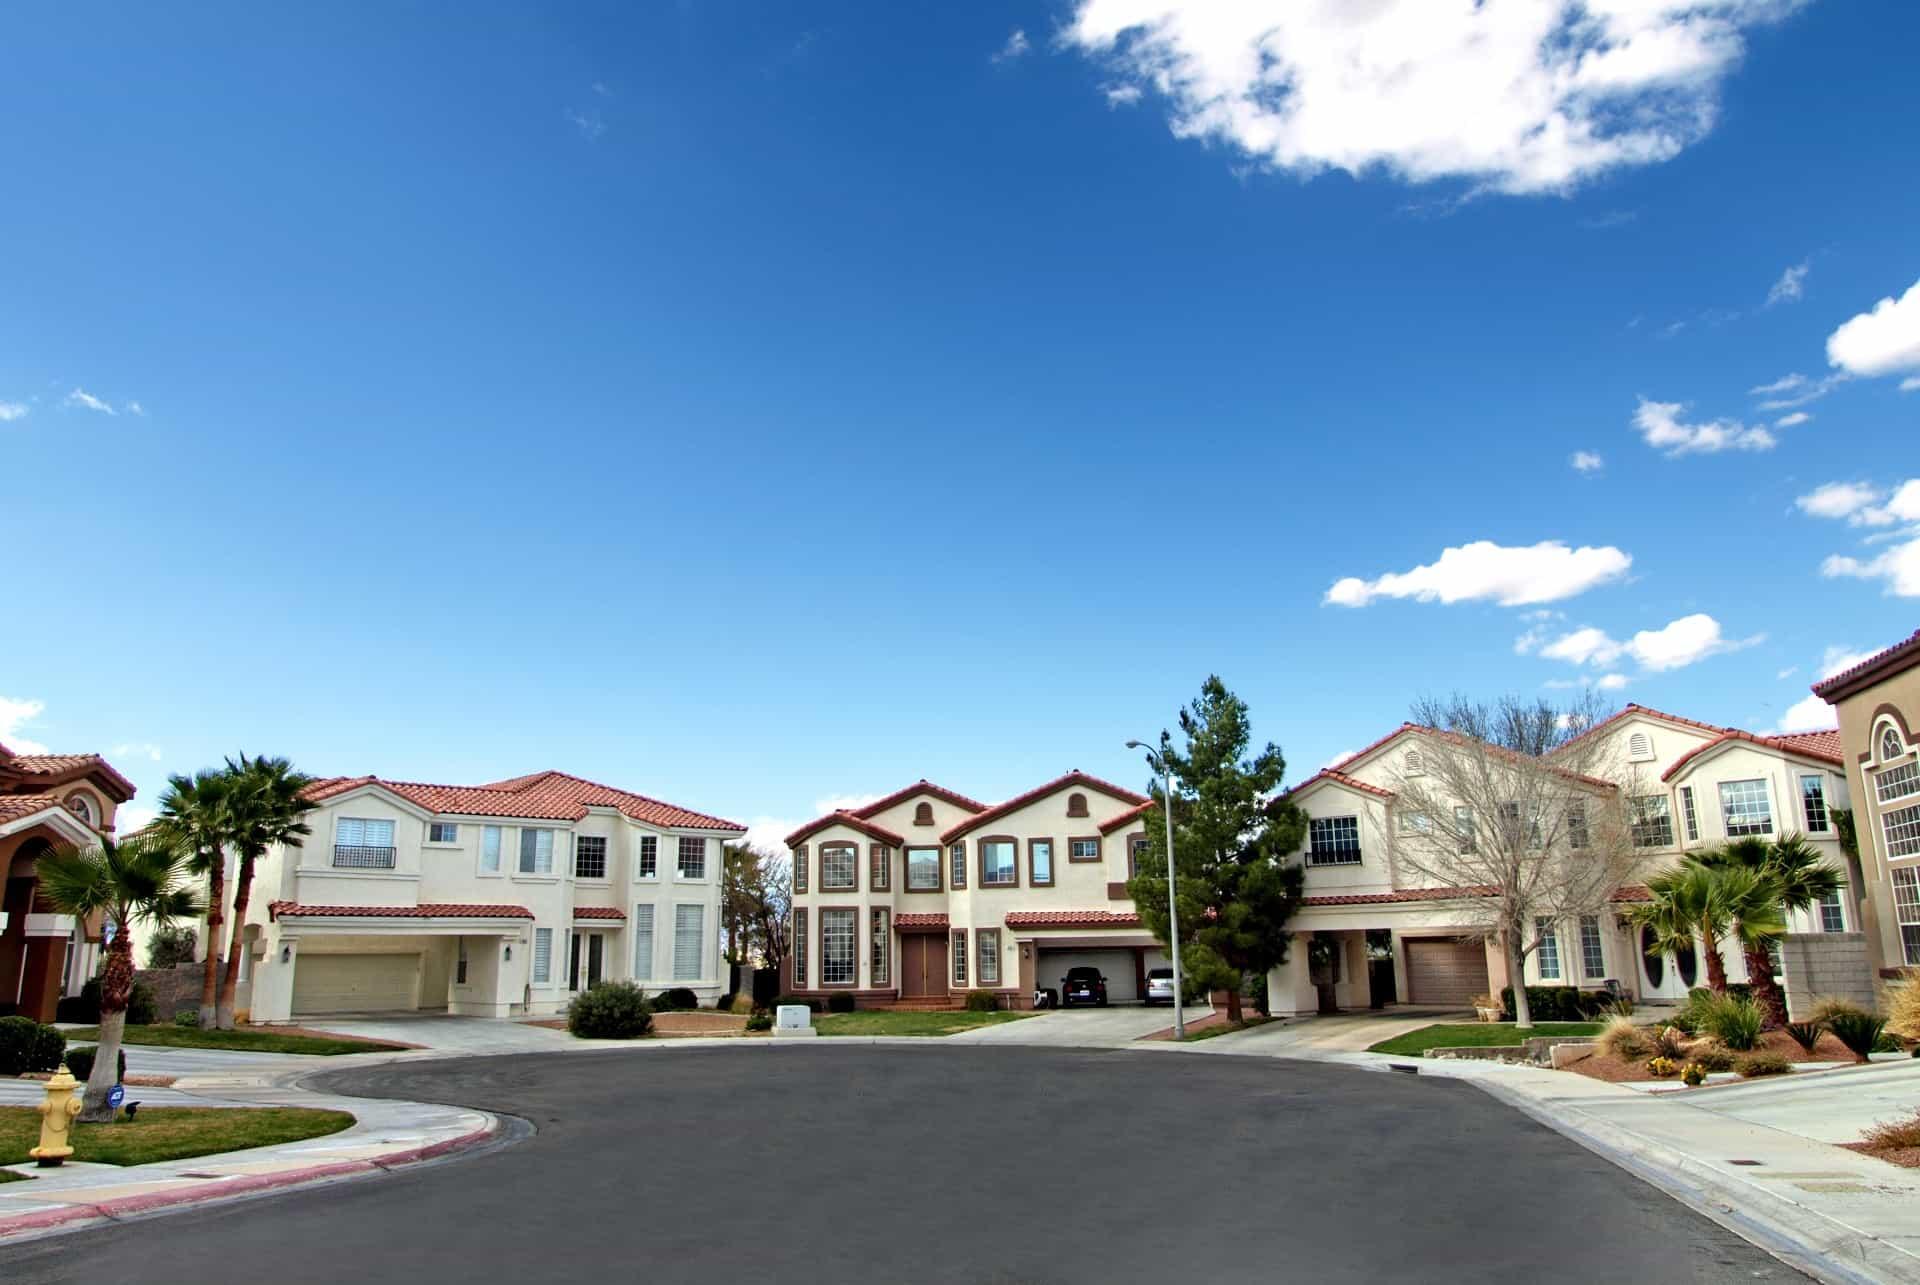 seven-hills-marquis-rob-jensen-company-guard-gated-real-estate-summerlin-las-vegas-henderson-06